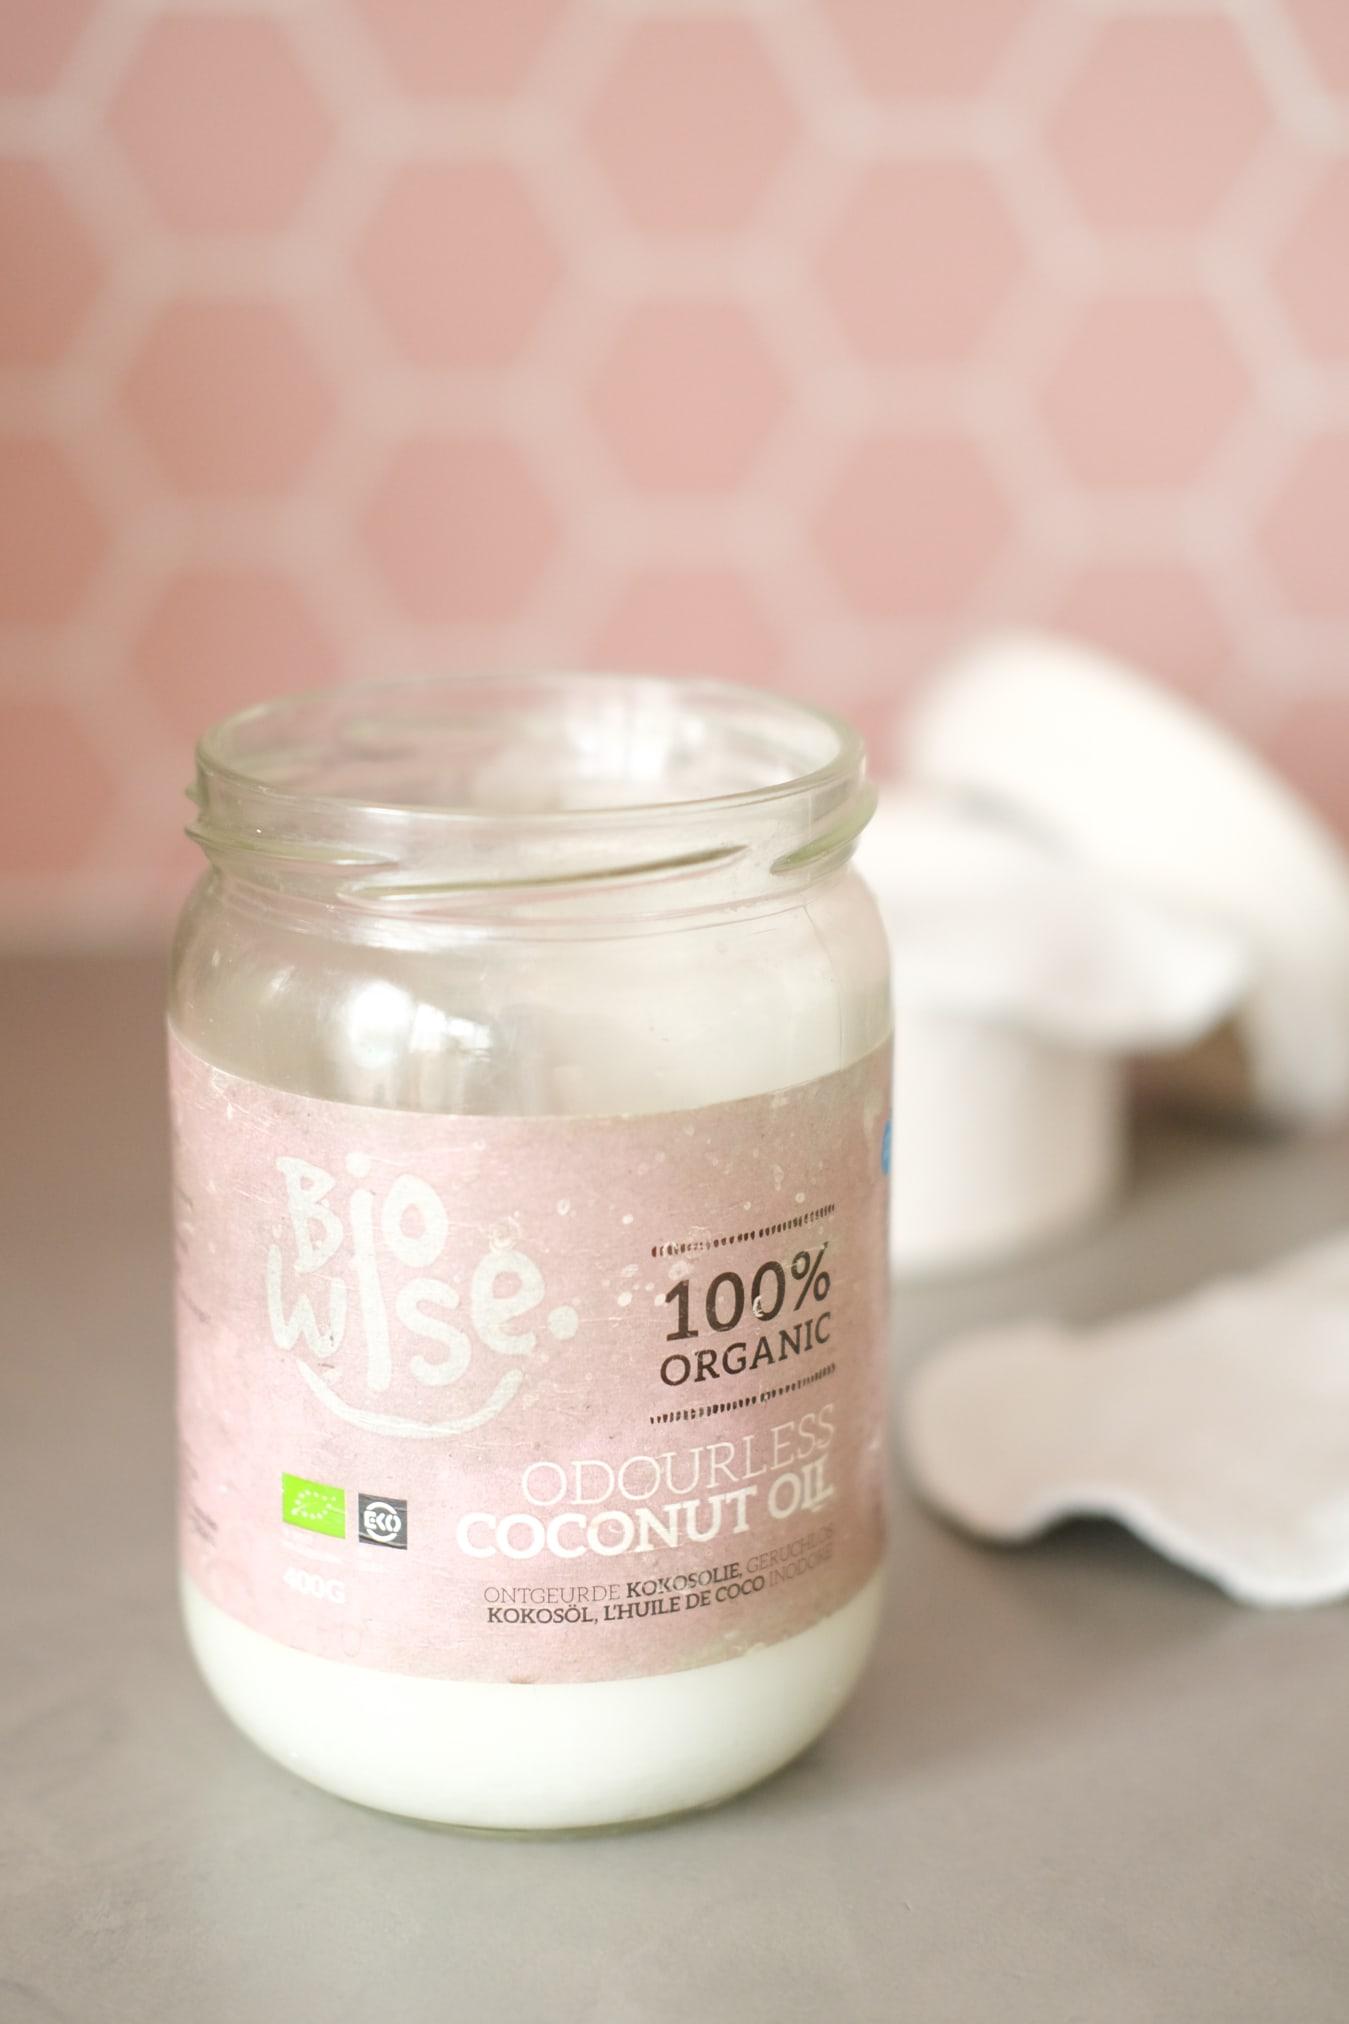 kokosolie make-up verwijderen